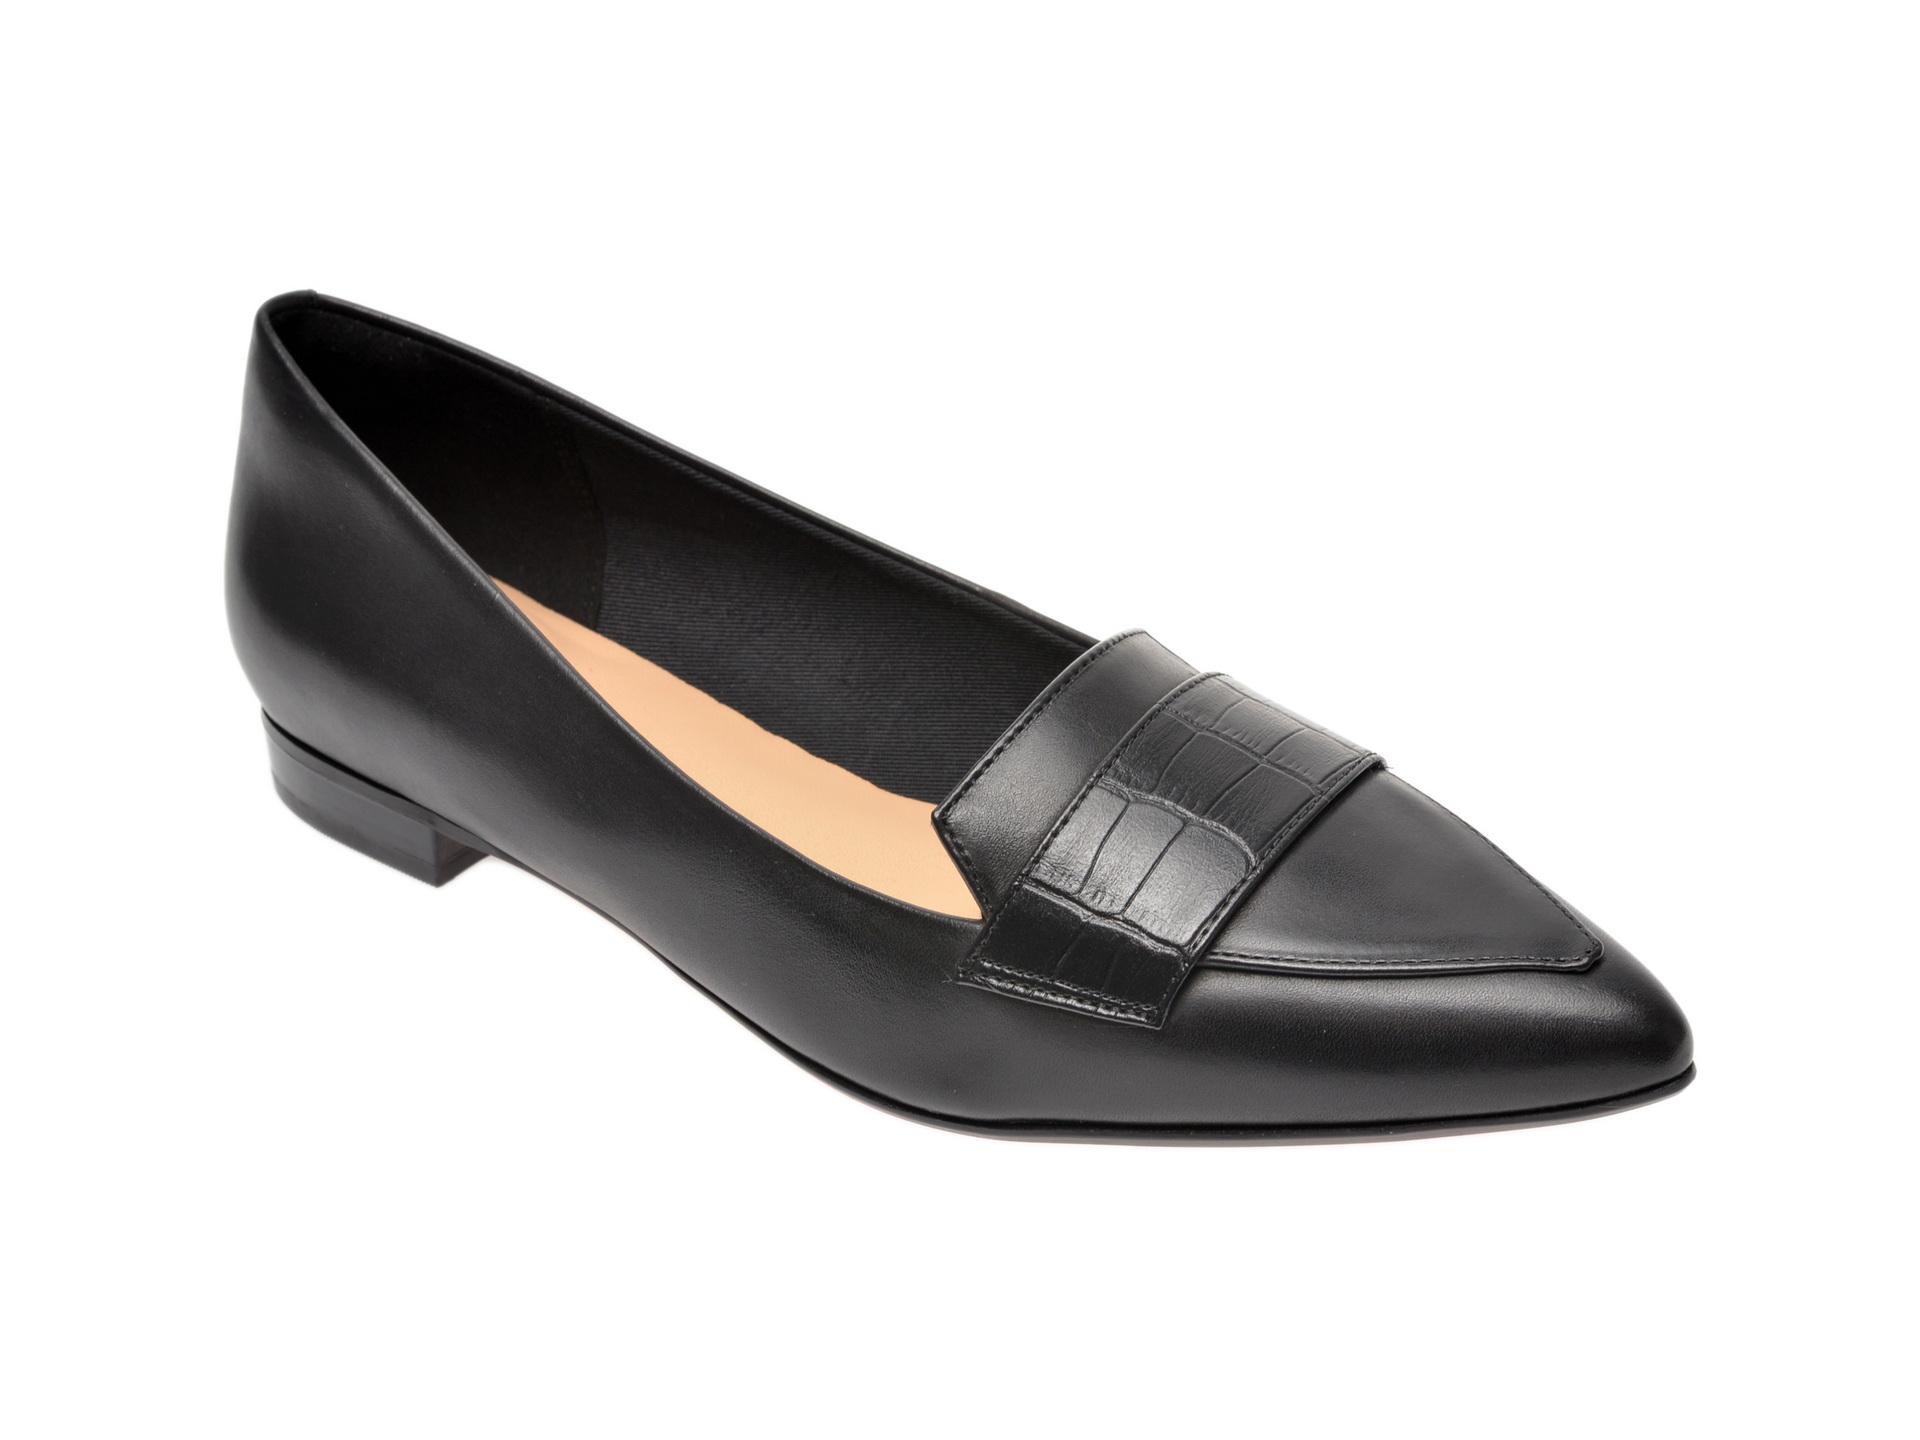 Pantofi CLARKS negri, Laina15 Loafer, din piele naturala New